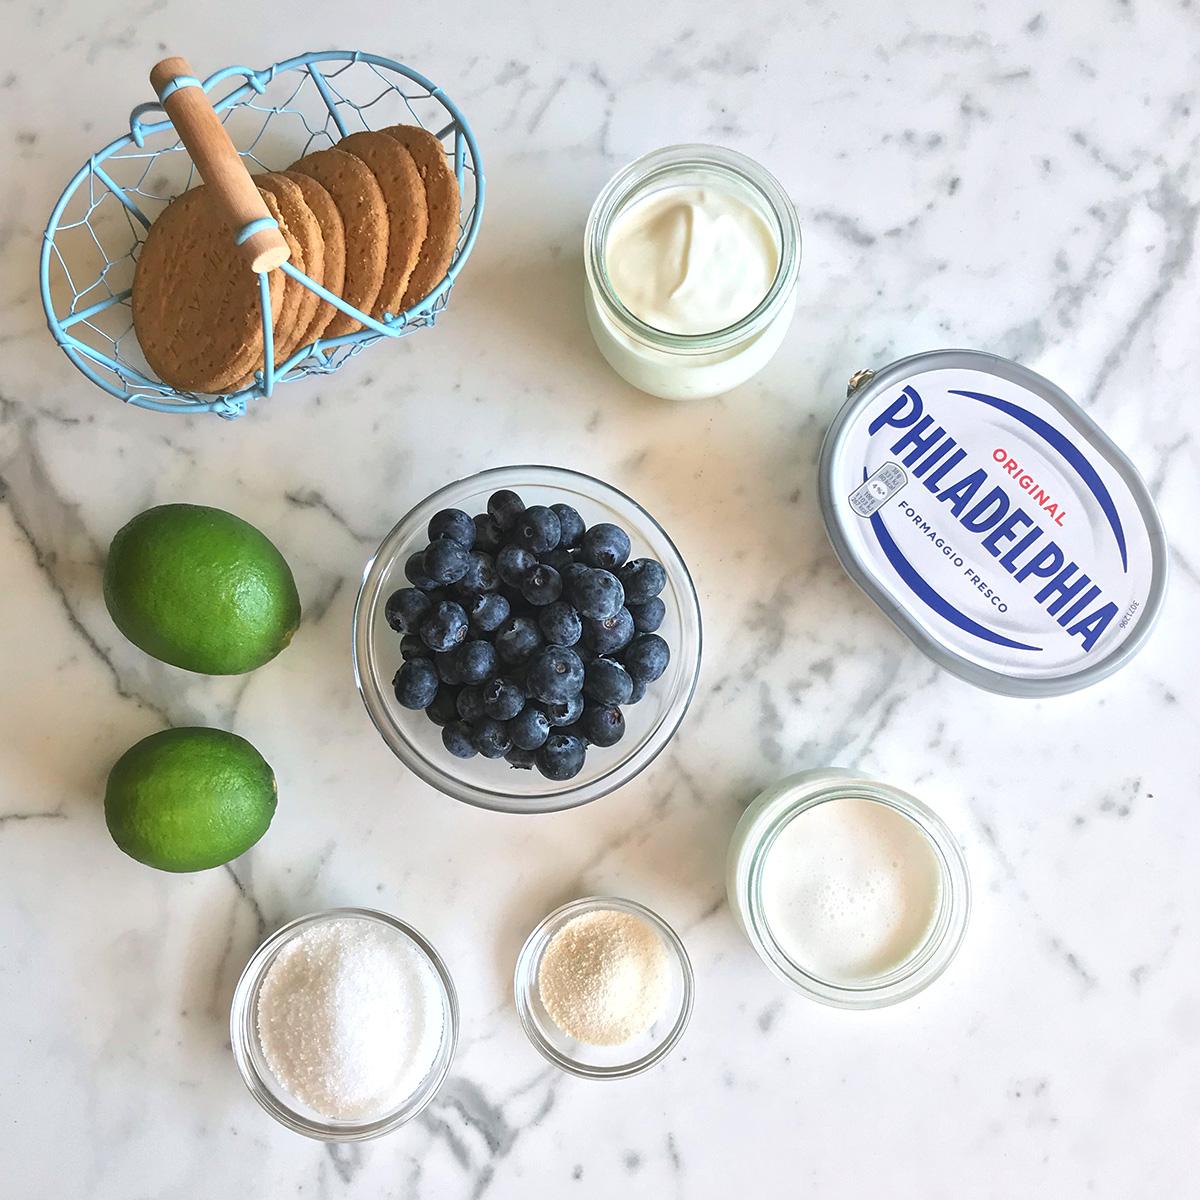 cheesecake_mirtilli_lime_ingredienti